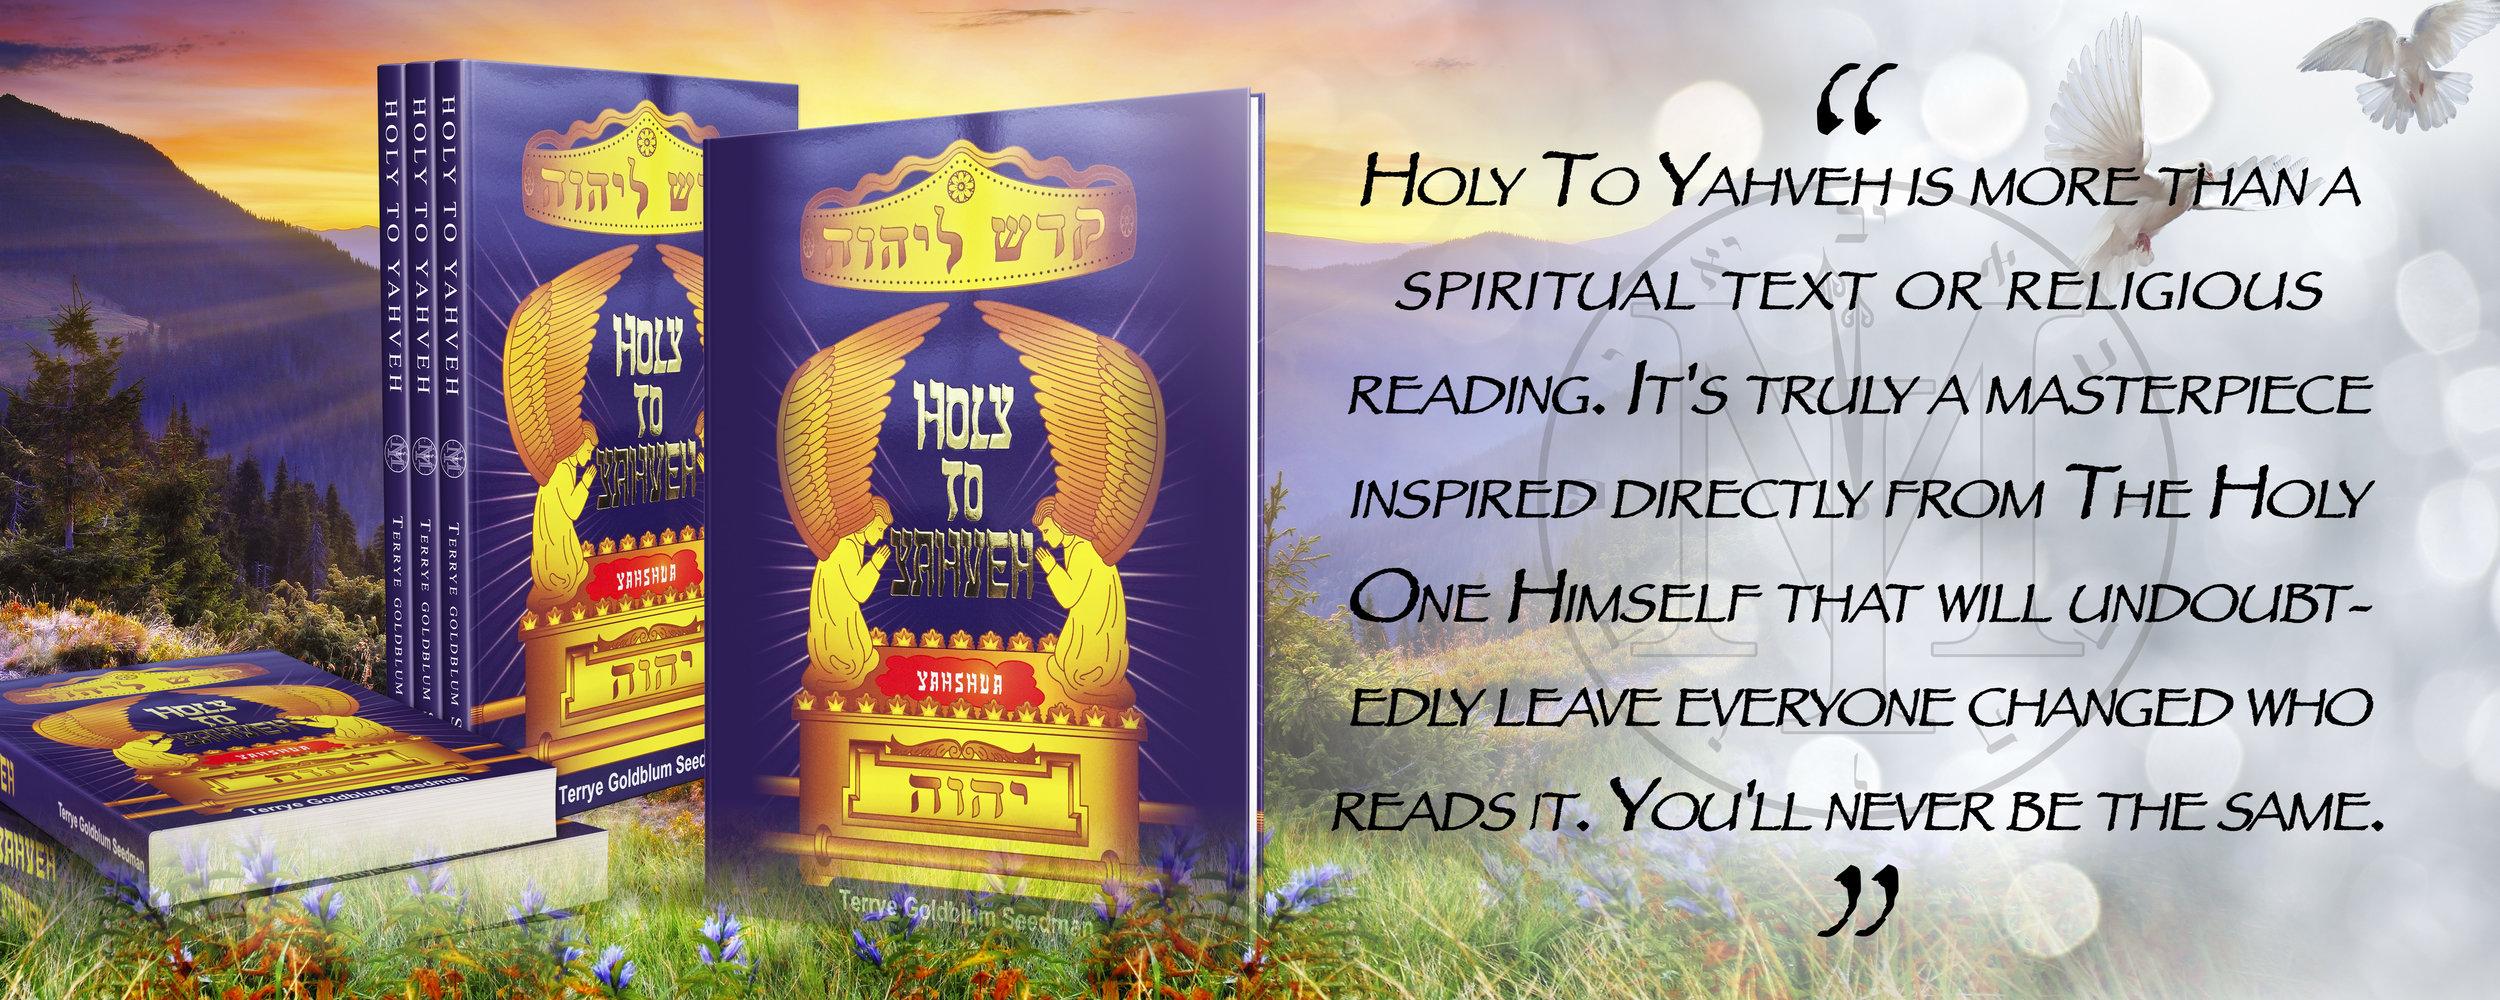 Testimonial 3 - Holy to Yahveh.jpg